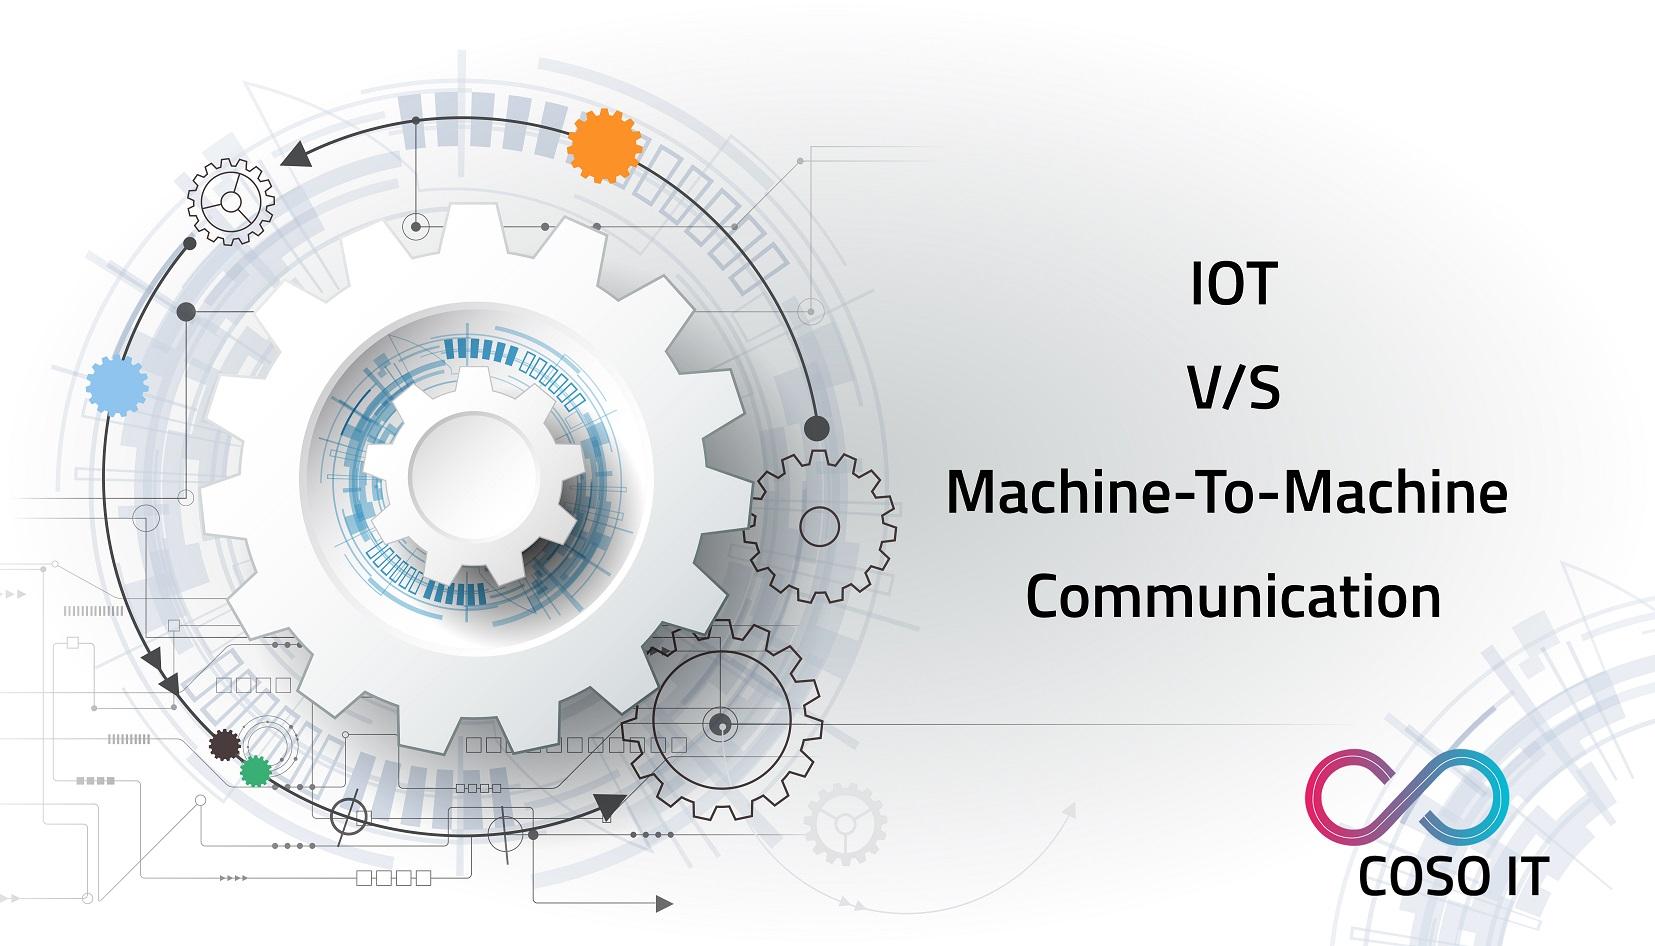 IoT Vs Machine-to-Machine Communication: Comparing The Key Aspects